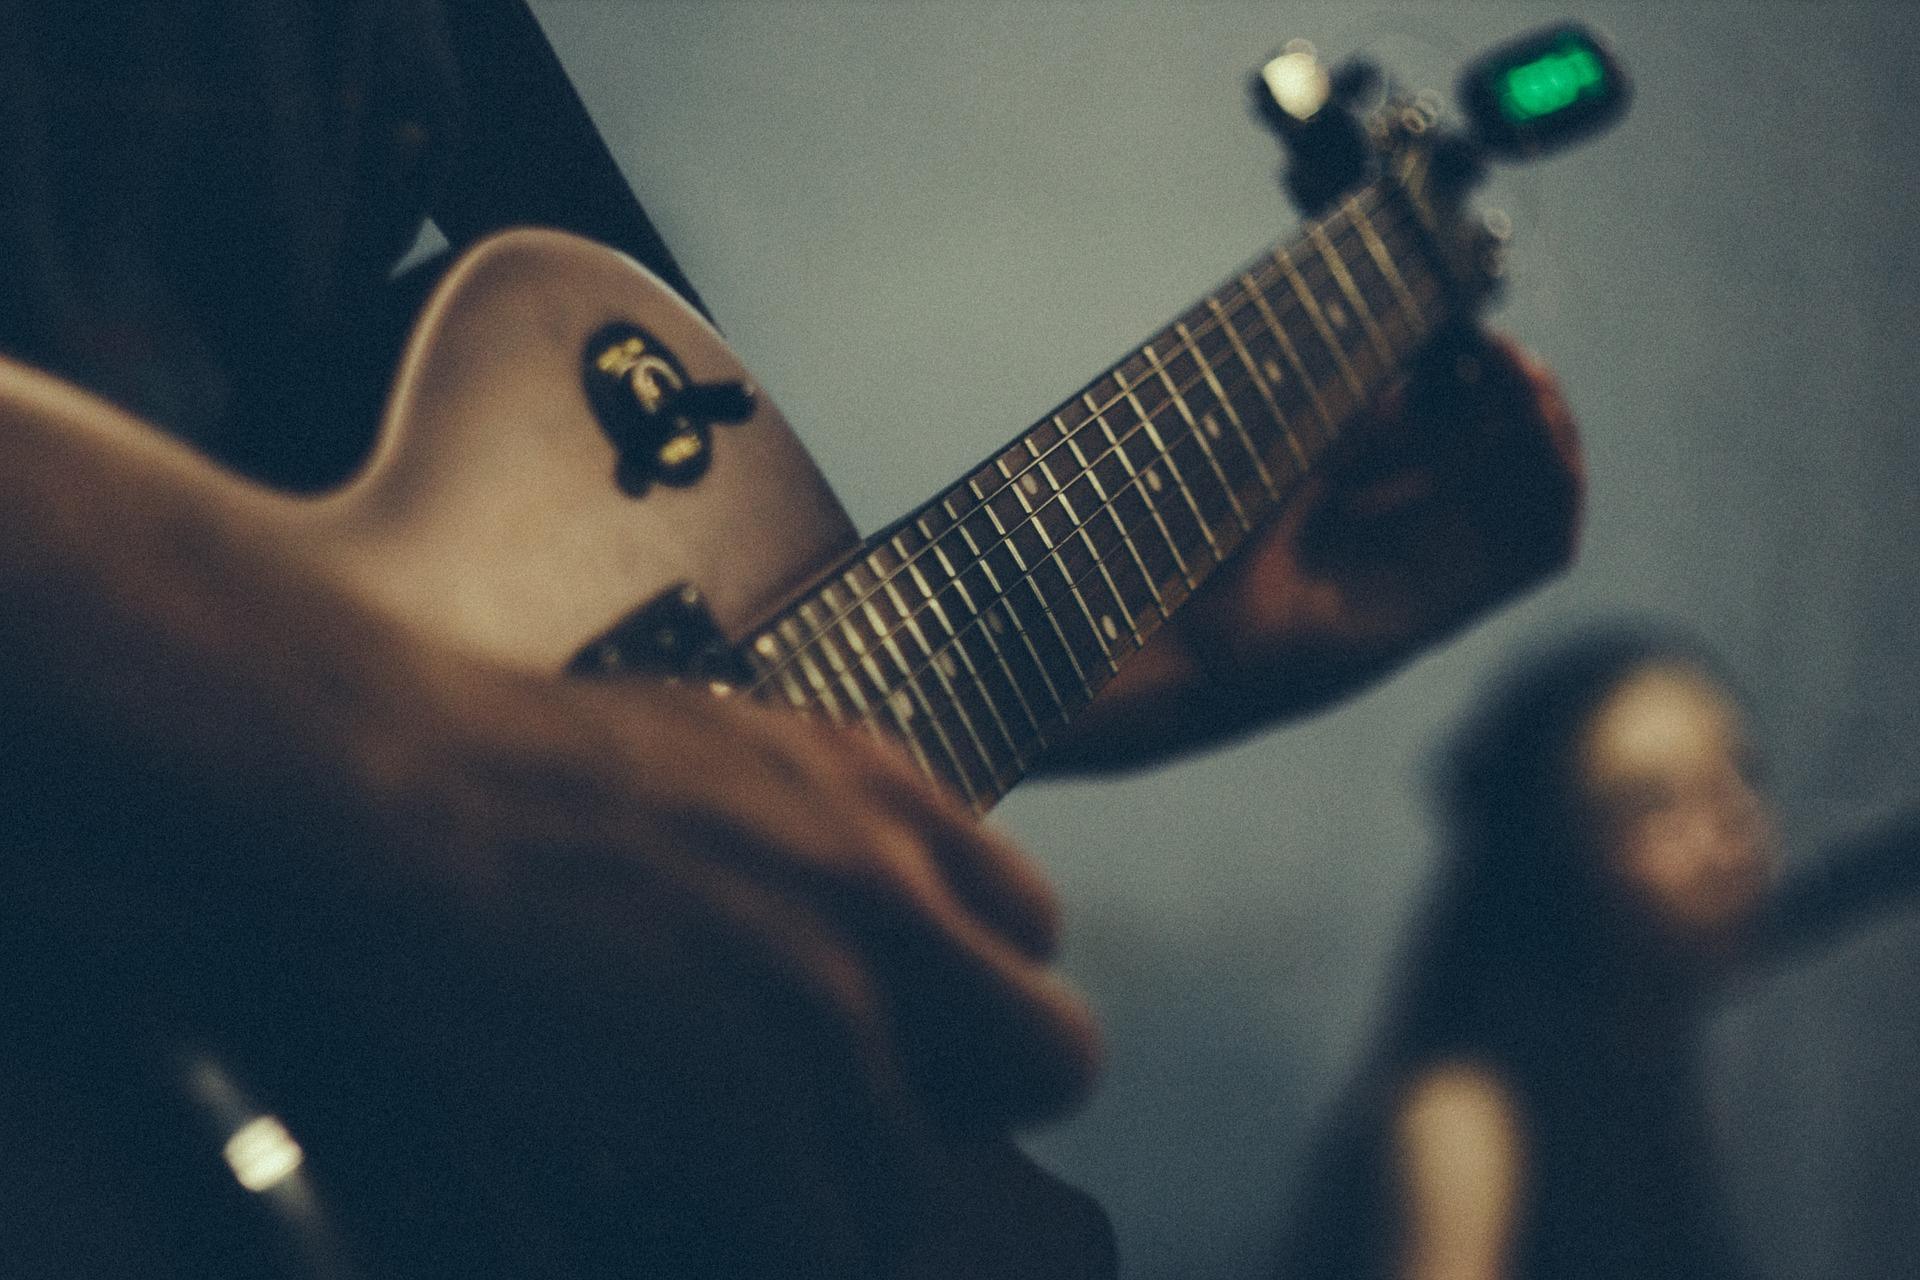 Advanced Guitar Workshop - Refresher tips for